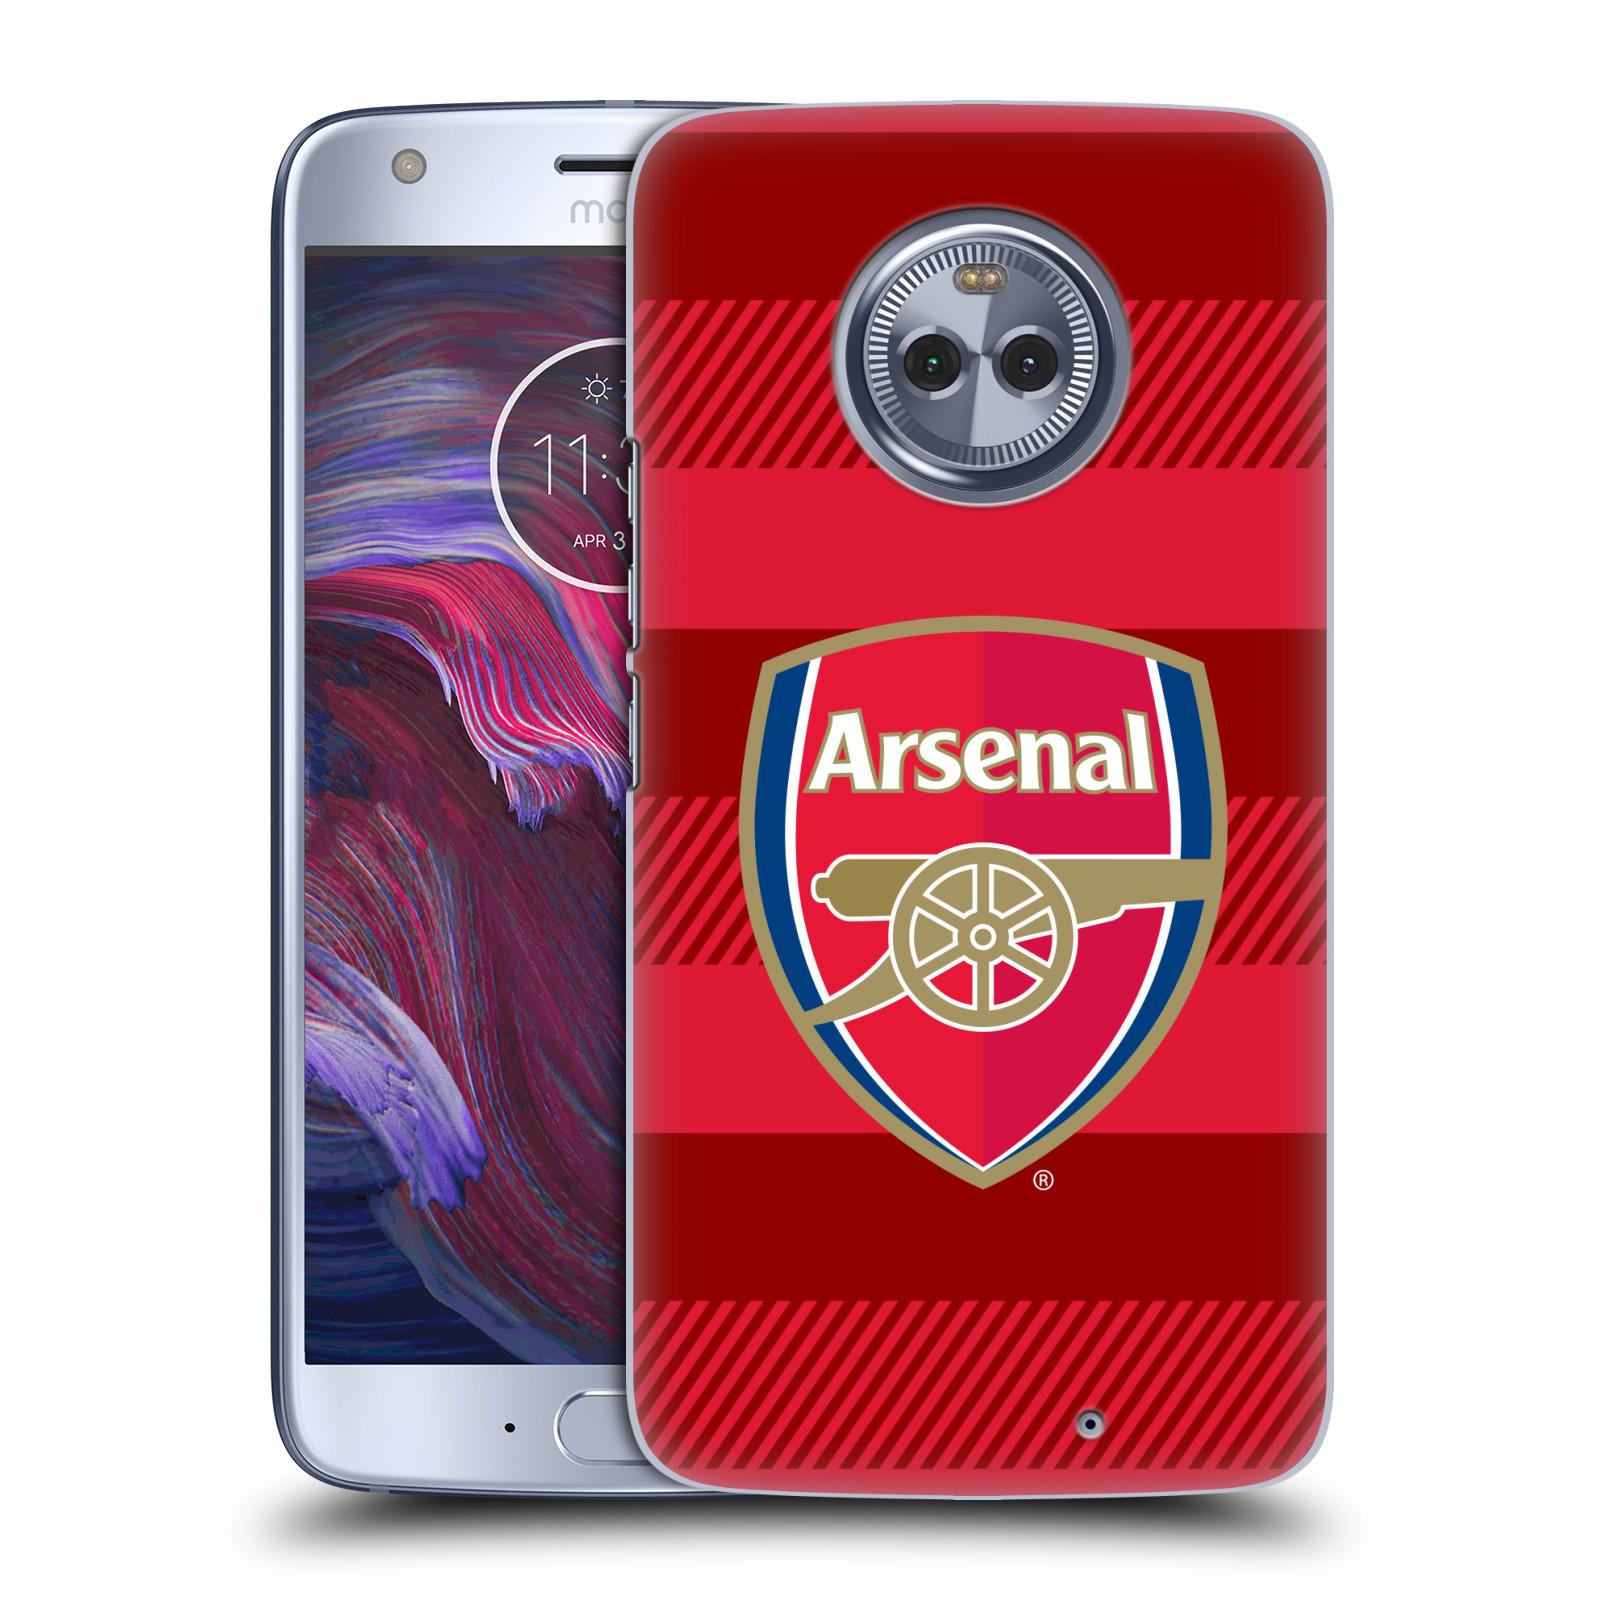 Plastové pouzdro na mobil Lenovo Moto X4 - Head Case - Arsenal FC - Logo s pruhy